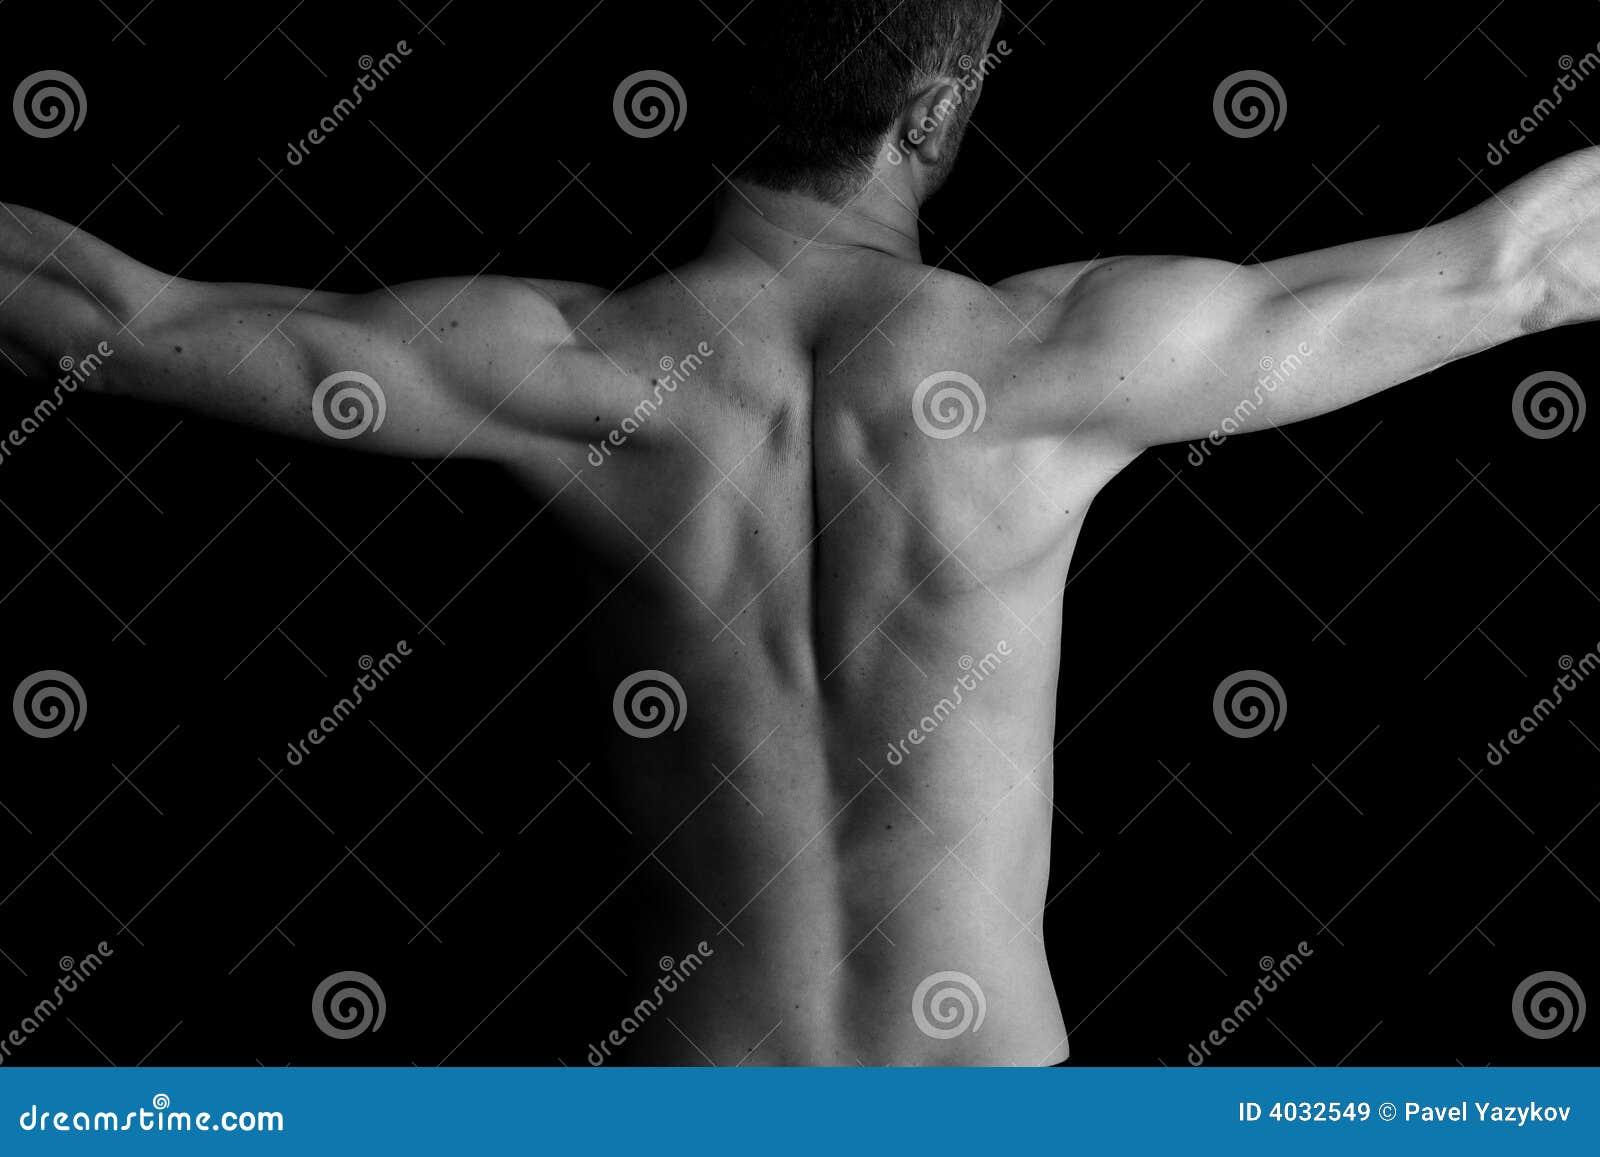 Athletic man. Torso. Black and white